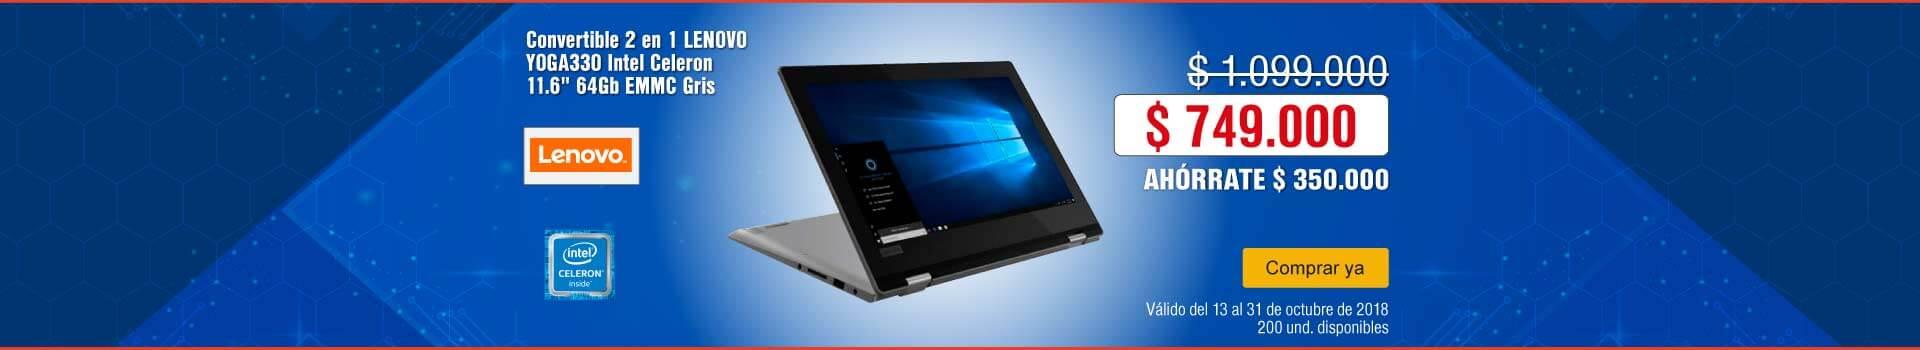 AK-BCAT-3-computadores y tablets-PP---Lenovo-2en1 YOGA330-Oct13